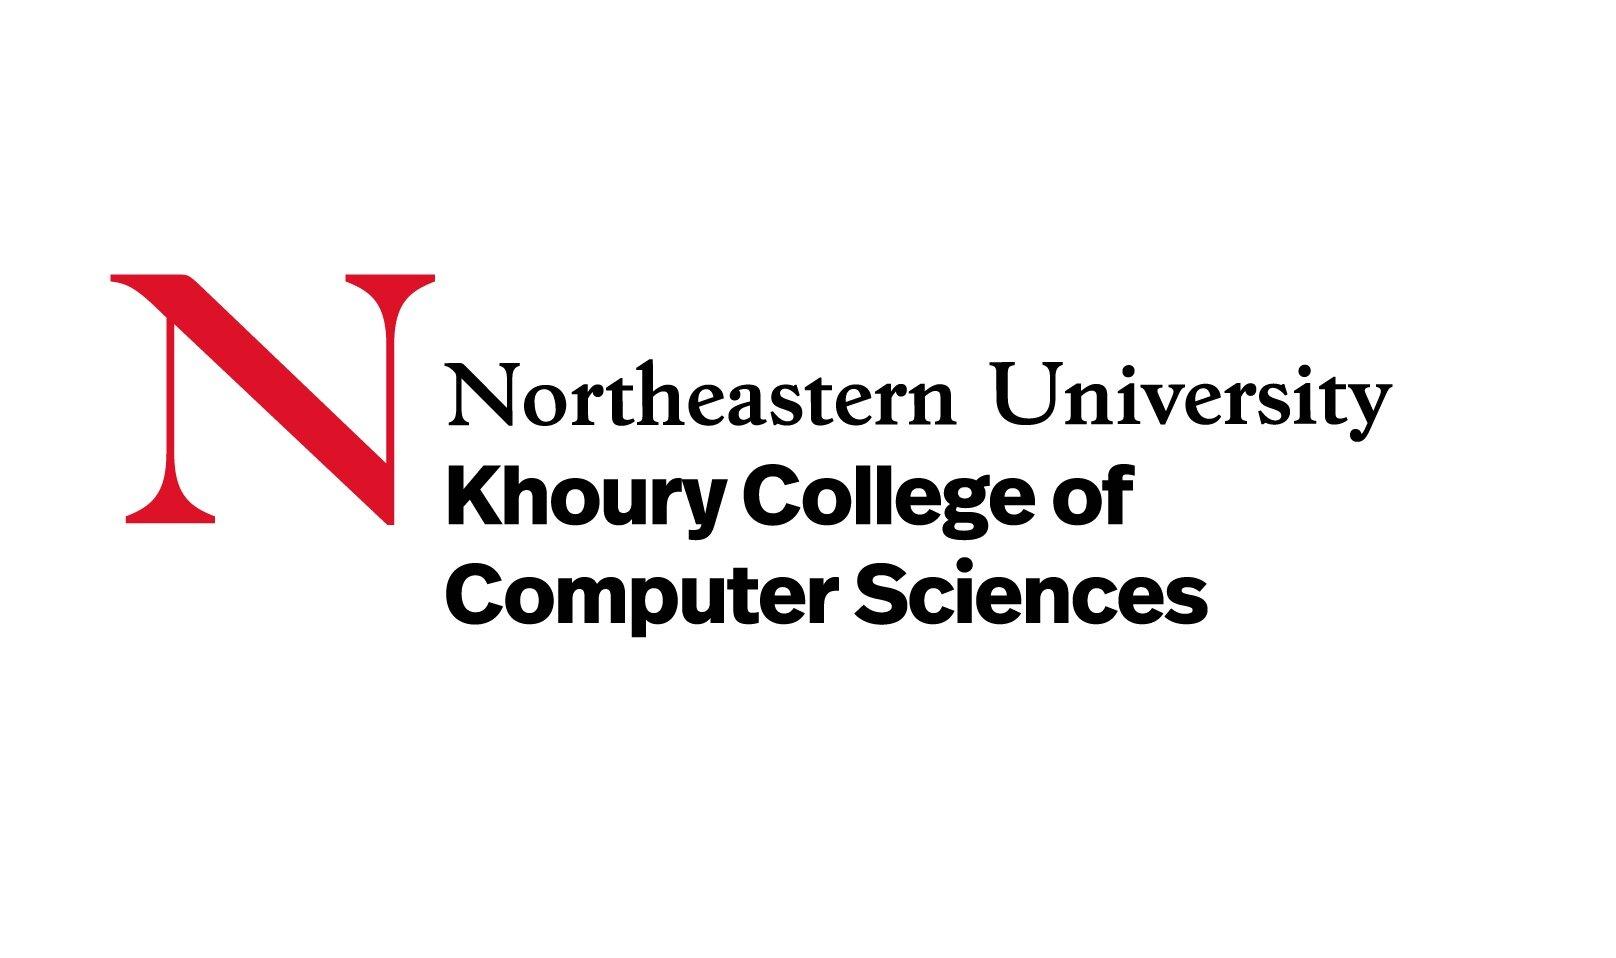 NU_KCCS_MonoNU_01_RB+%282%29.jpg